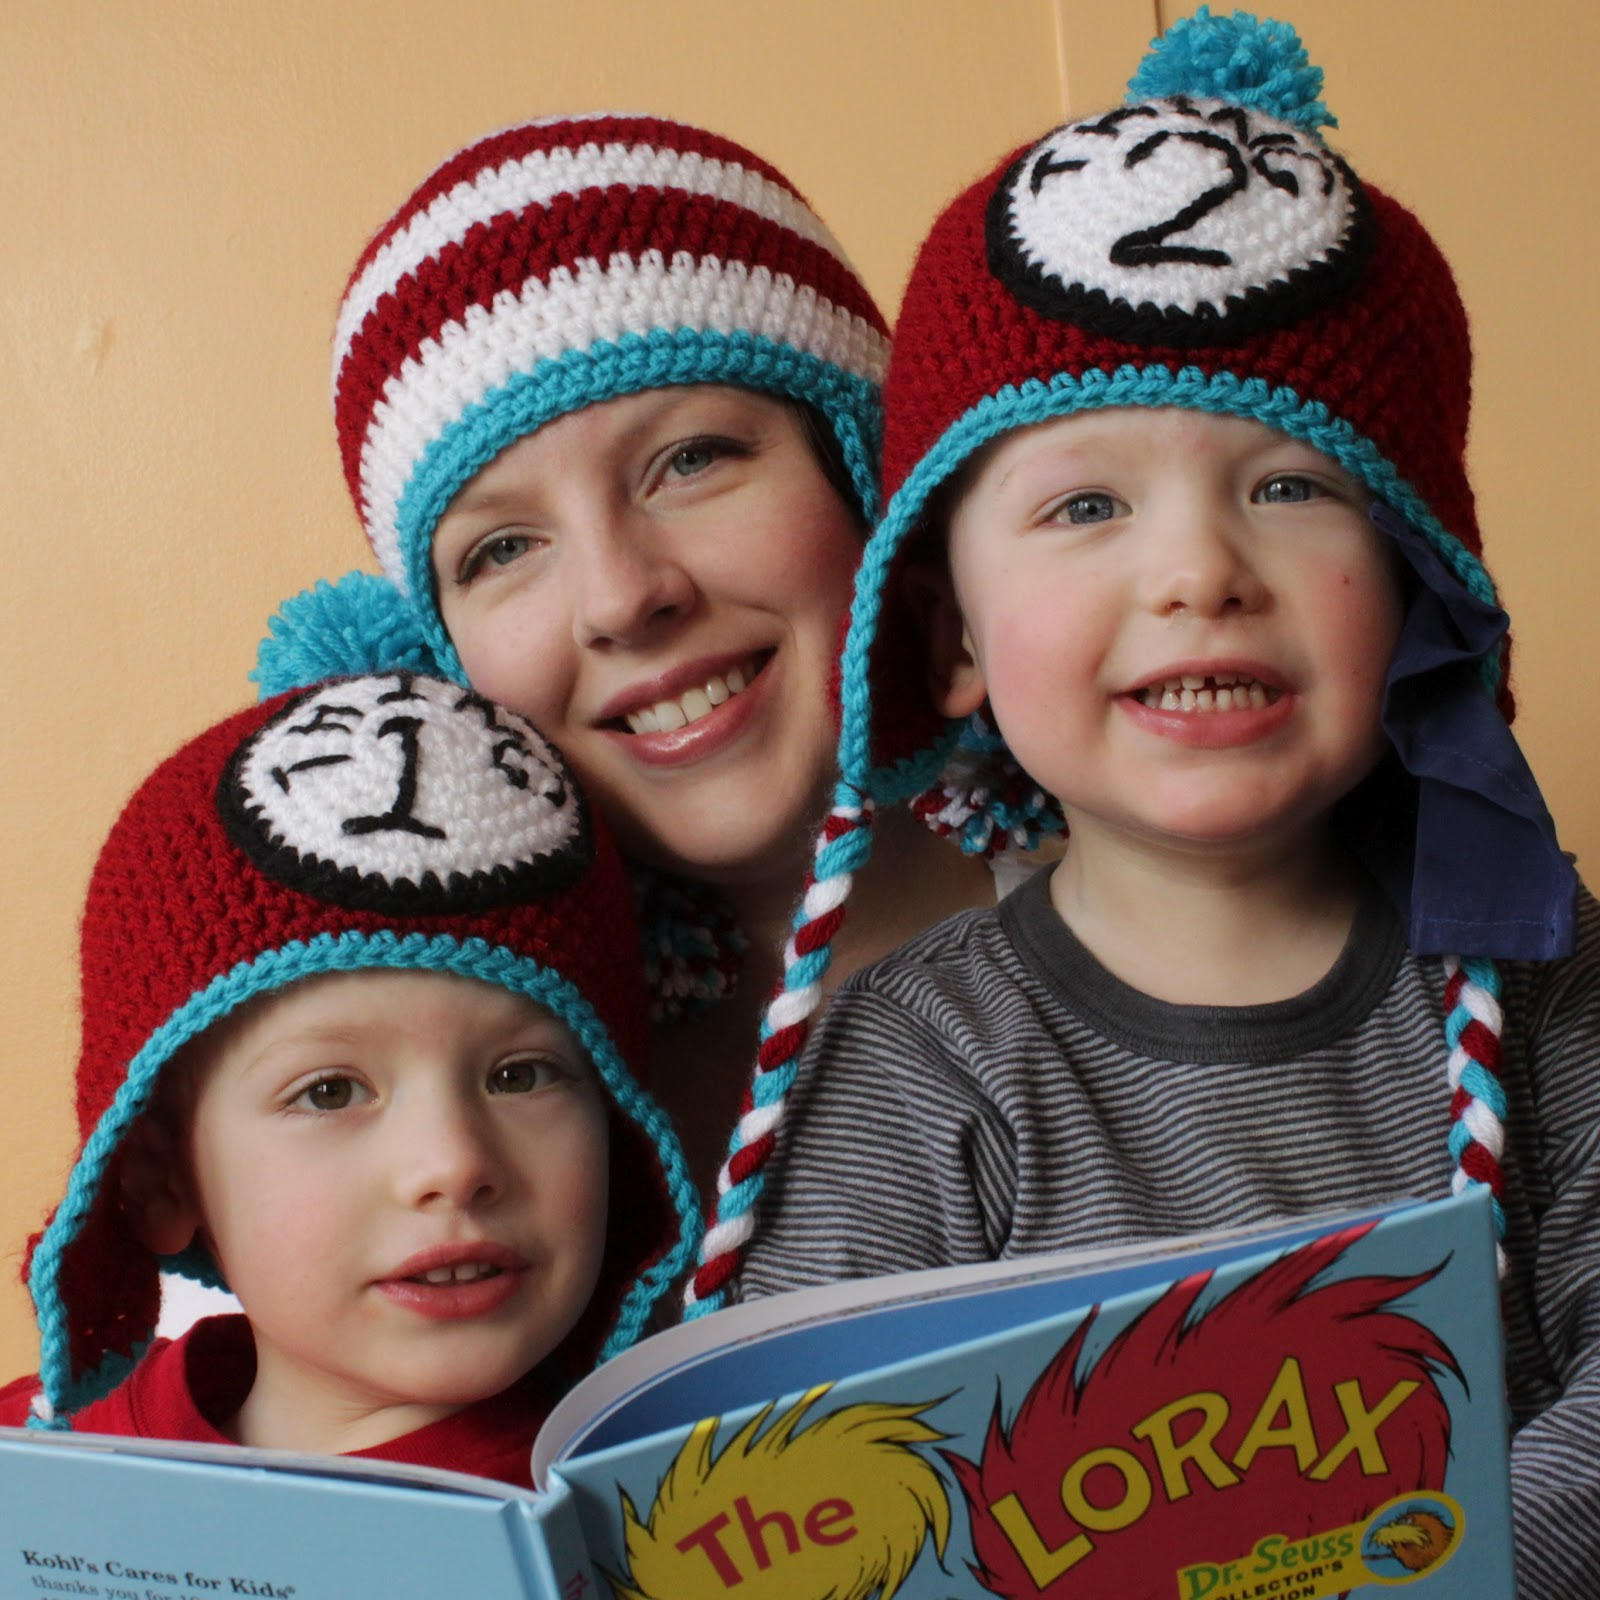 http://3.bp.blogspot.com/-PfCIu9aV8iM/T1BPgzQMoNI/AAAAAAAABhI/zZ2L6hgP7Rw/s1600/Dr.-Seuss-Crochet-Hats.jpg